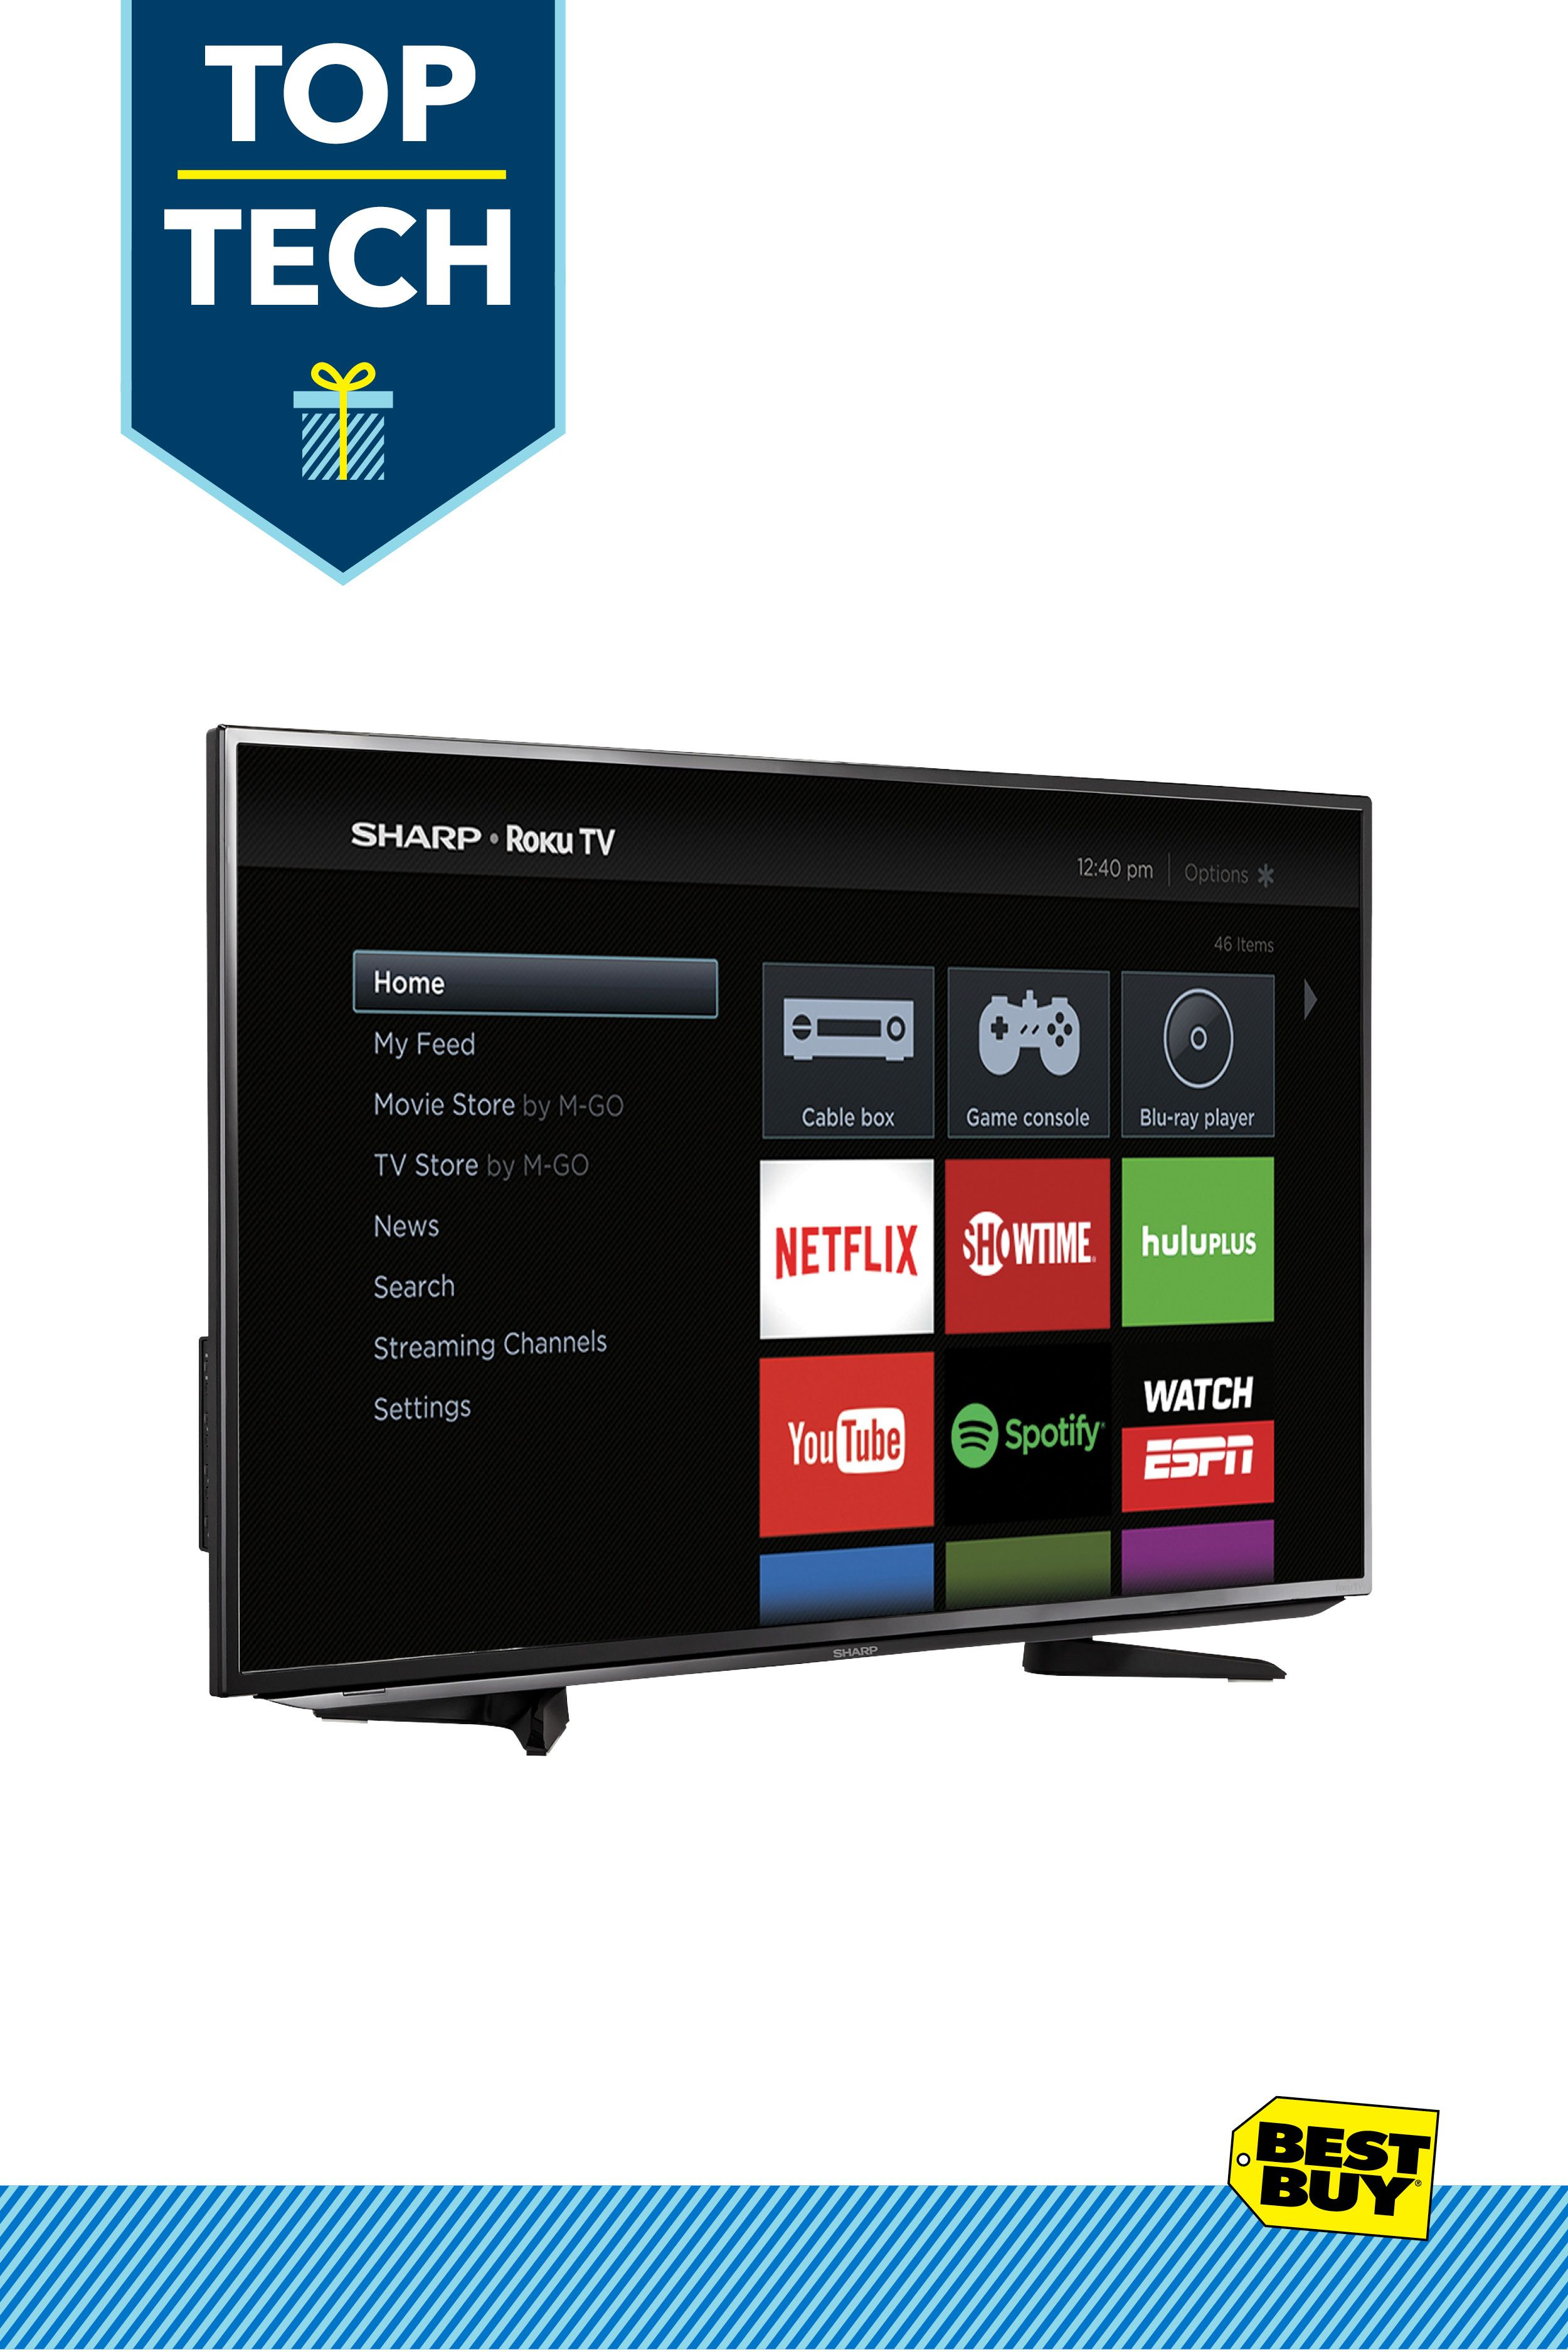 Sharp LC43LB371U LED Roku TV This Roku TV lets you